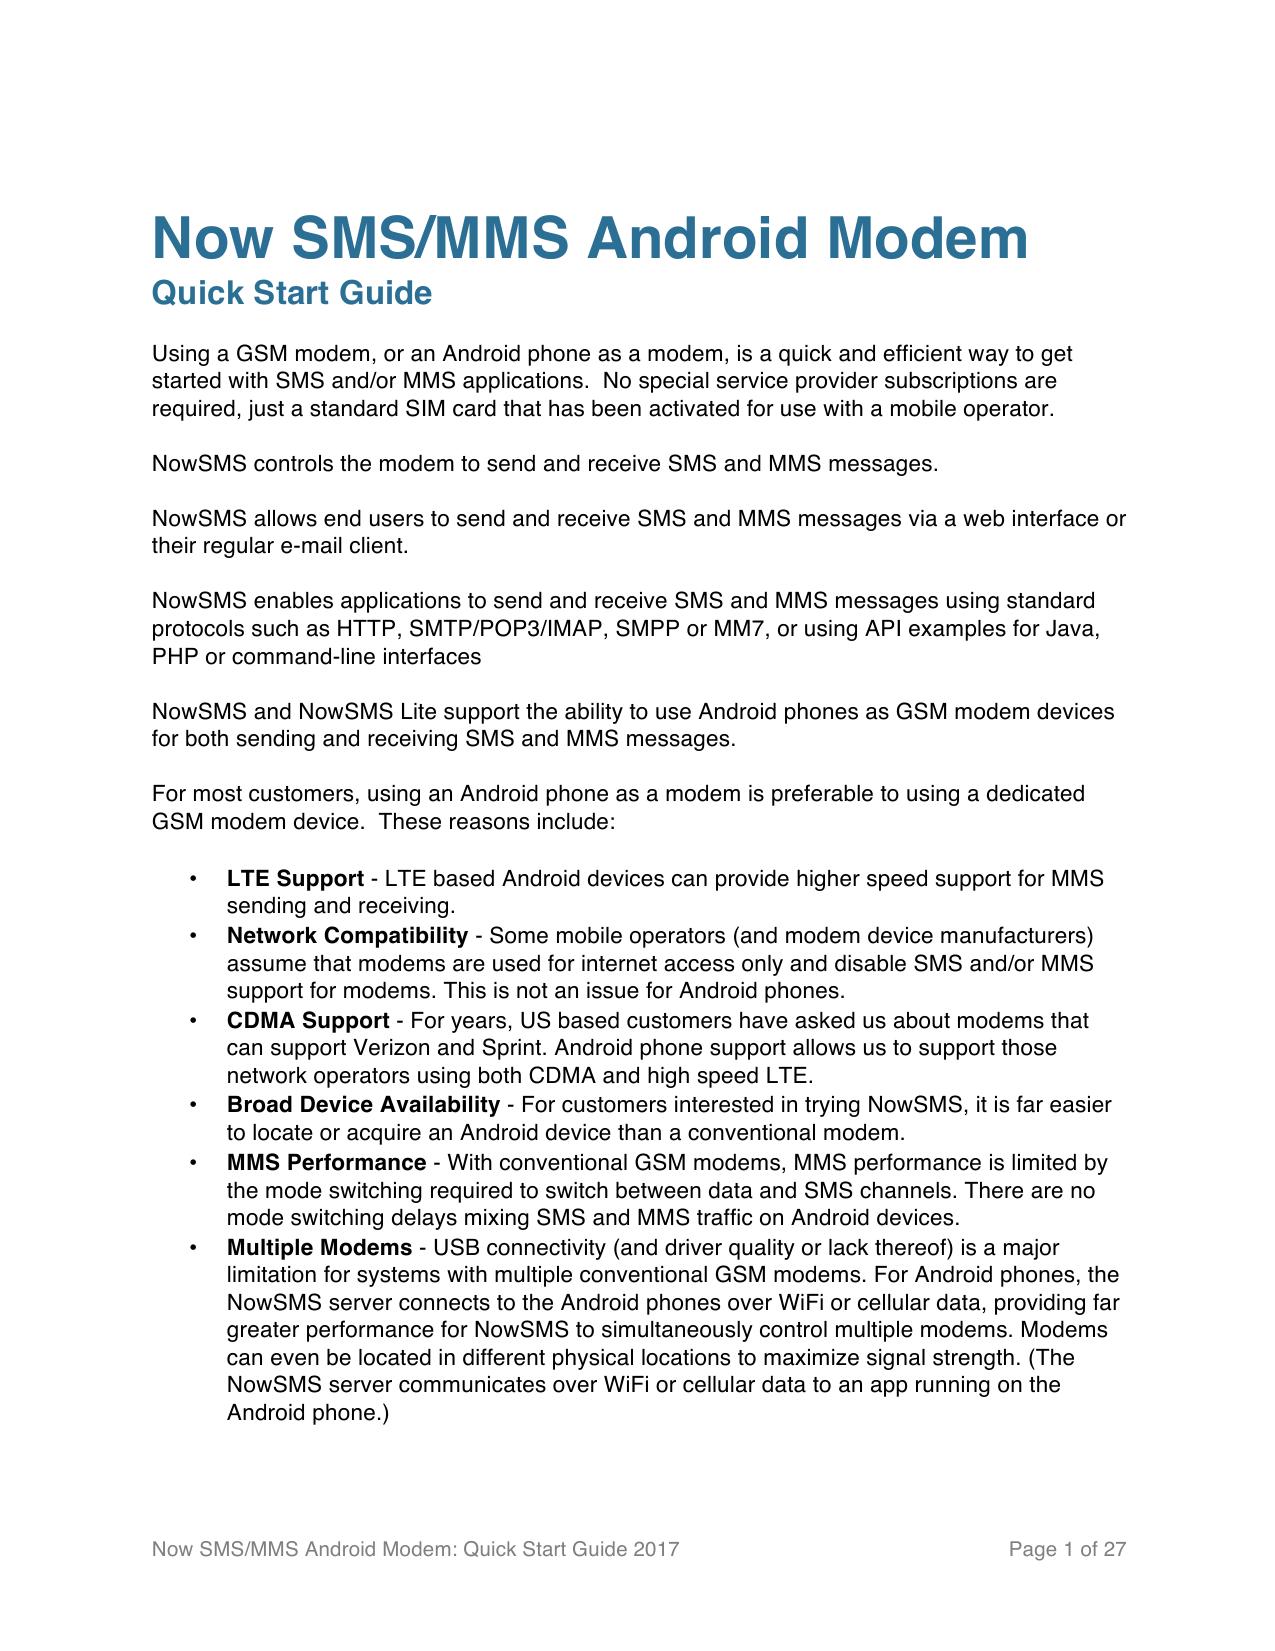 Now SMS/MMS Android Modem   manualzz com